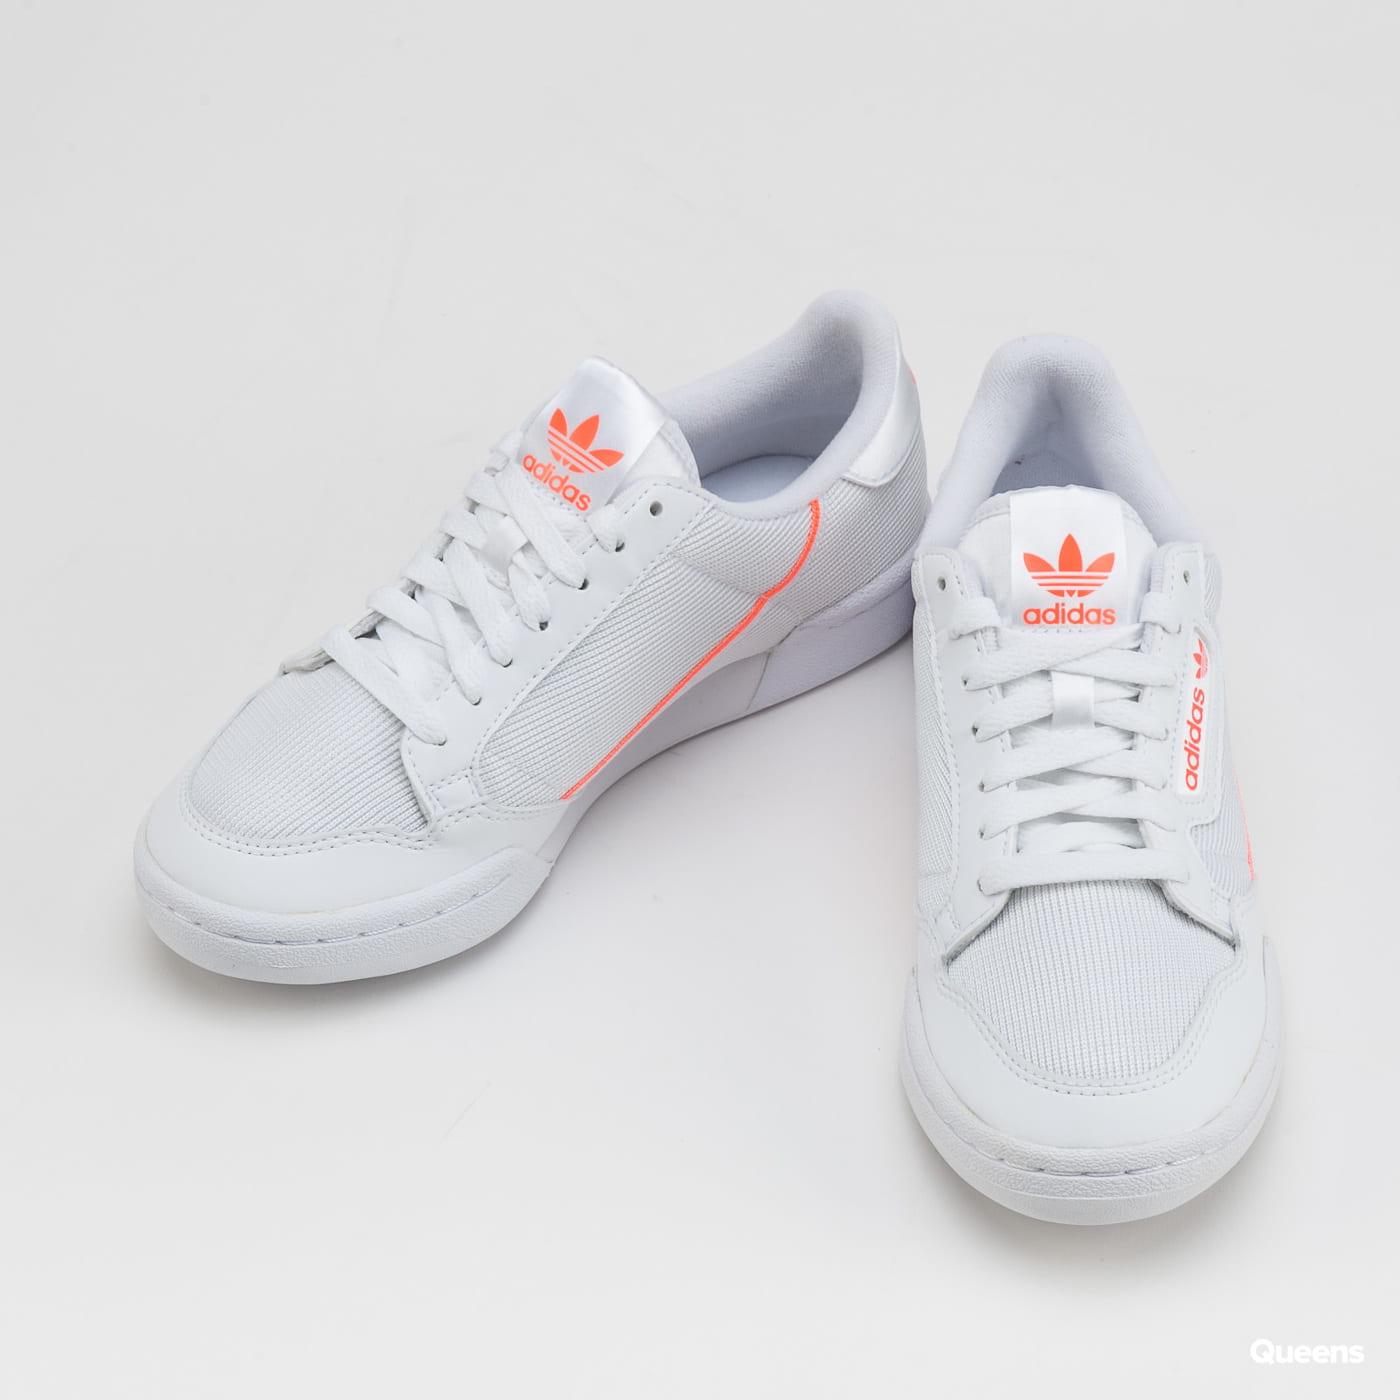 adidas Originals Continental 80 W ftwwht / sigcor / cblack